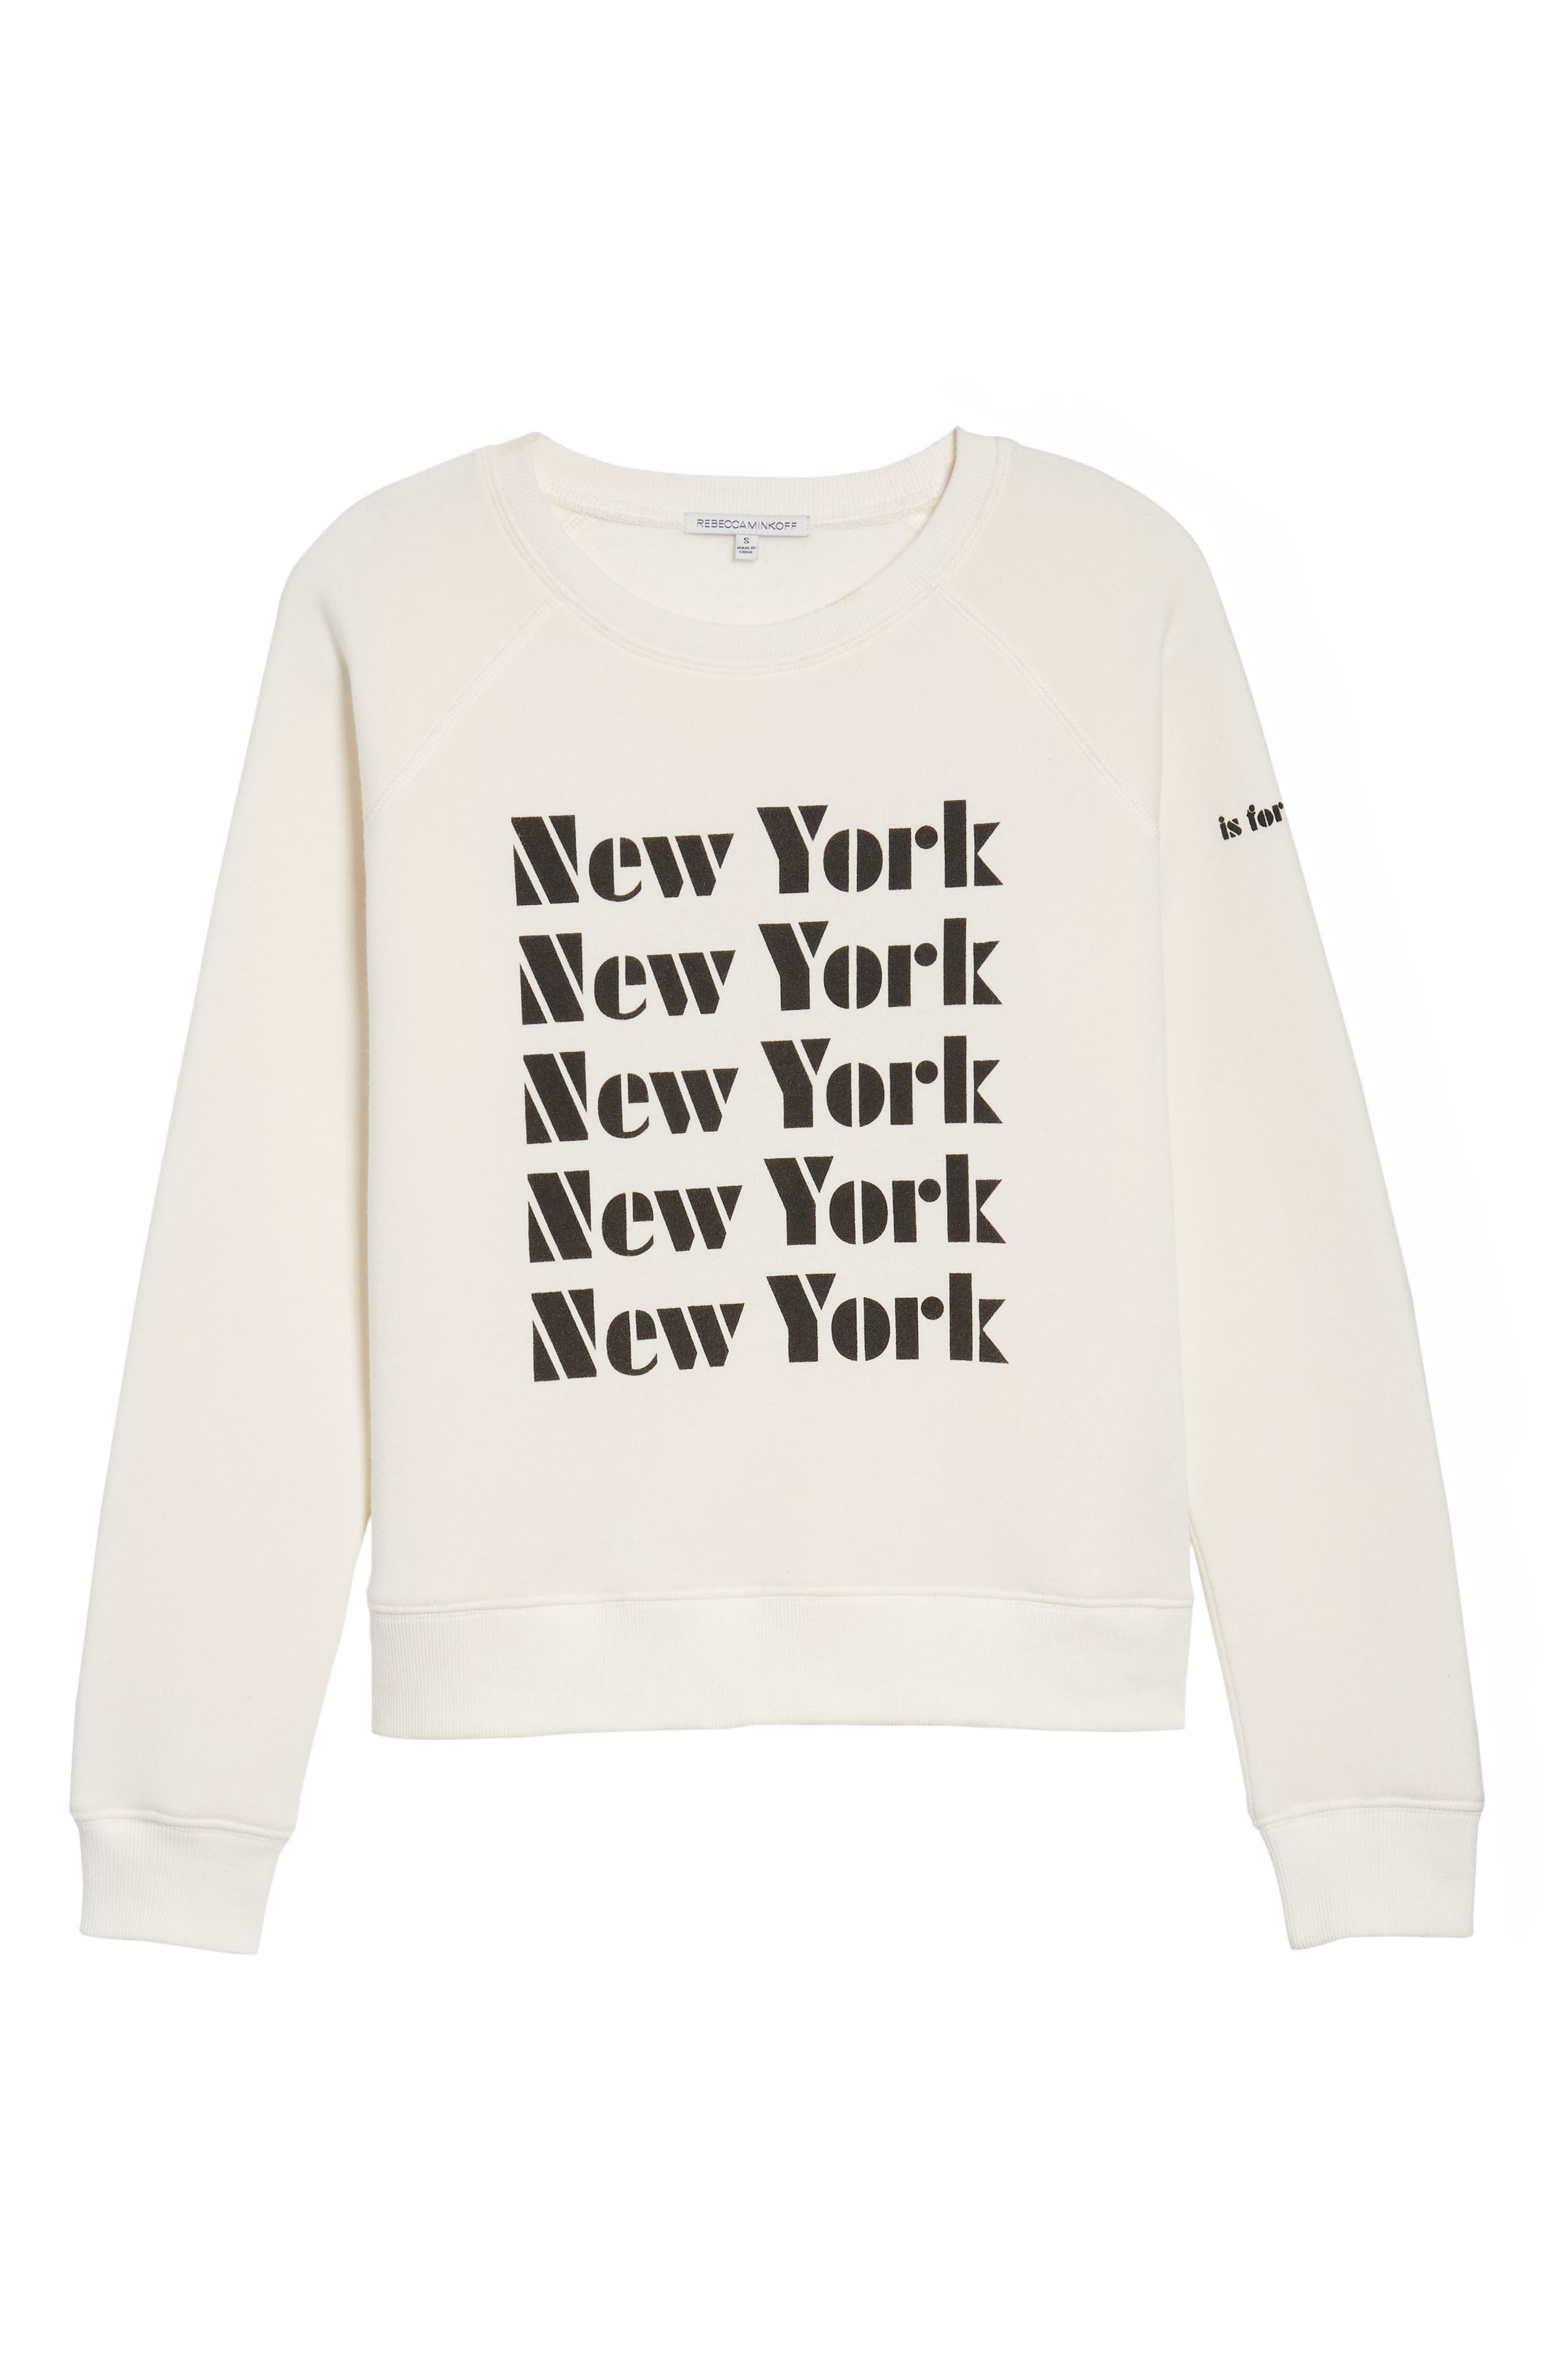 New York Sweatshirt,                             Alternate thumbnail 6, color,                             901